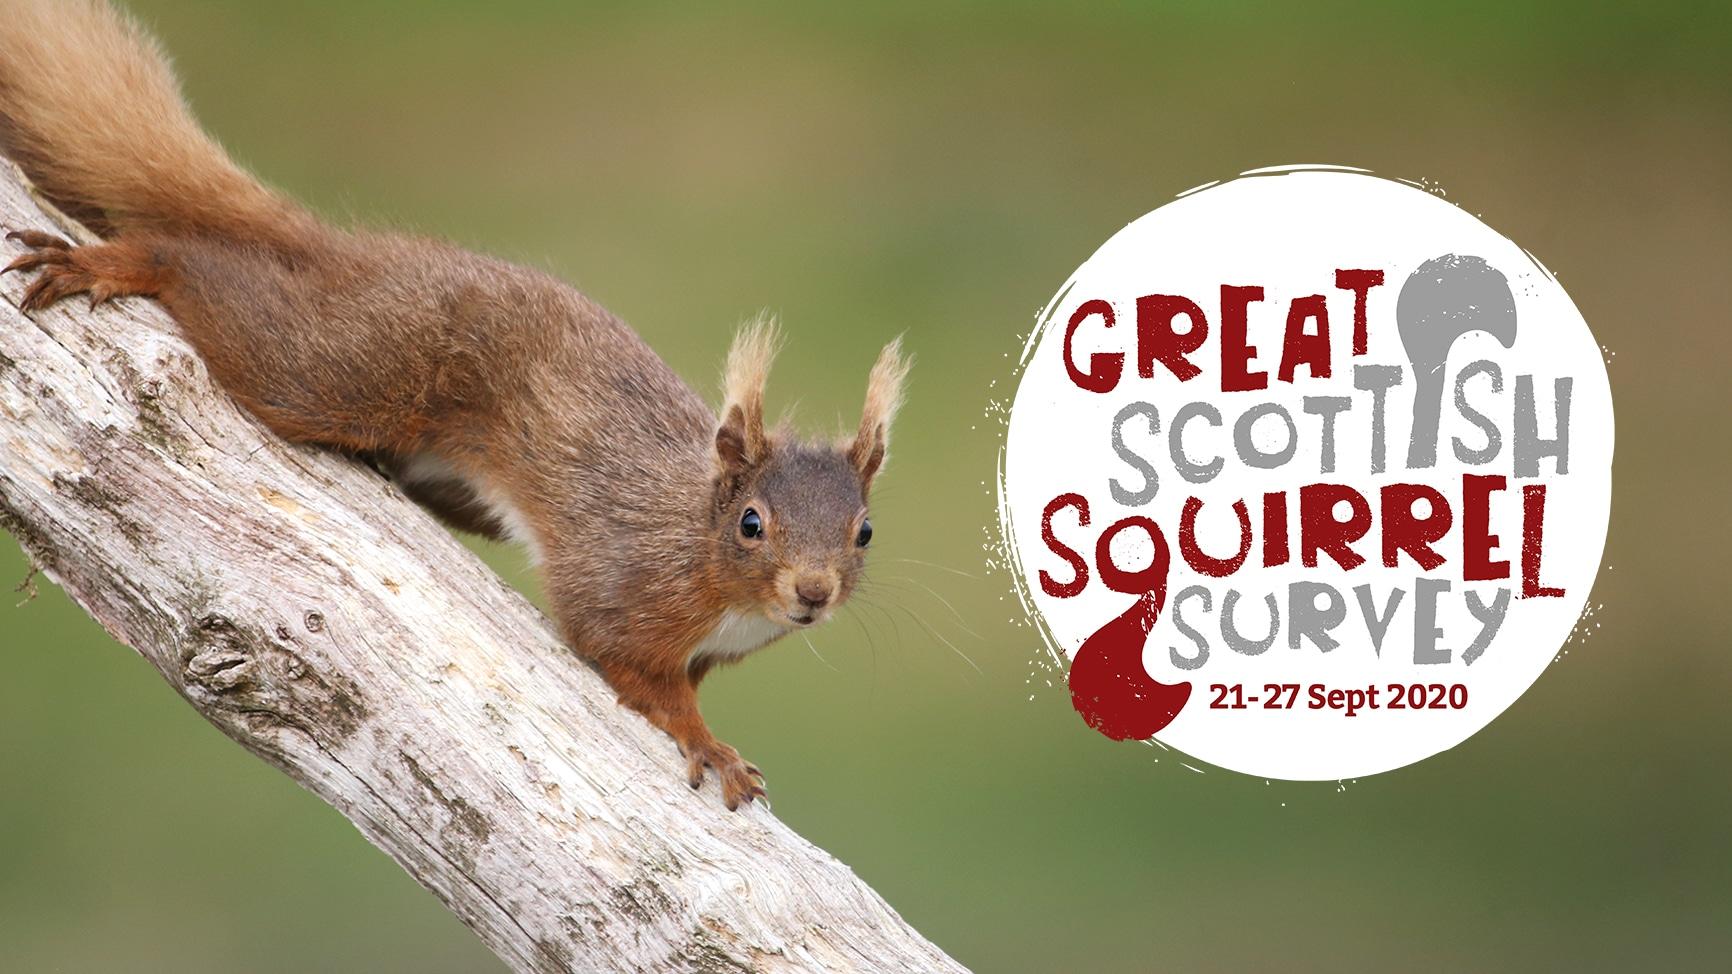 Get squirrel spotting